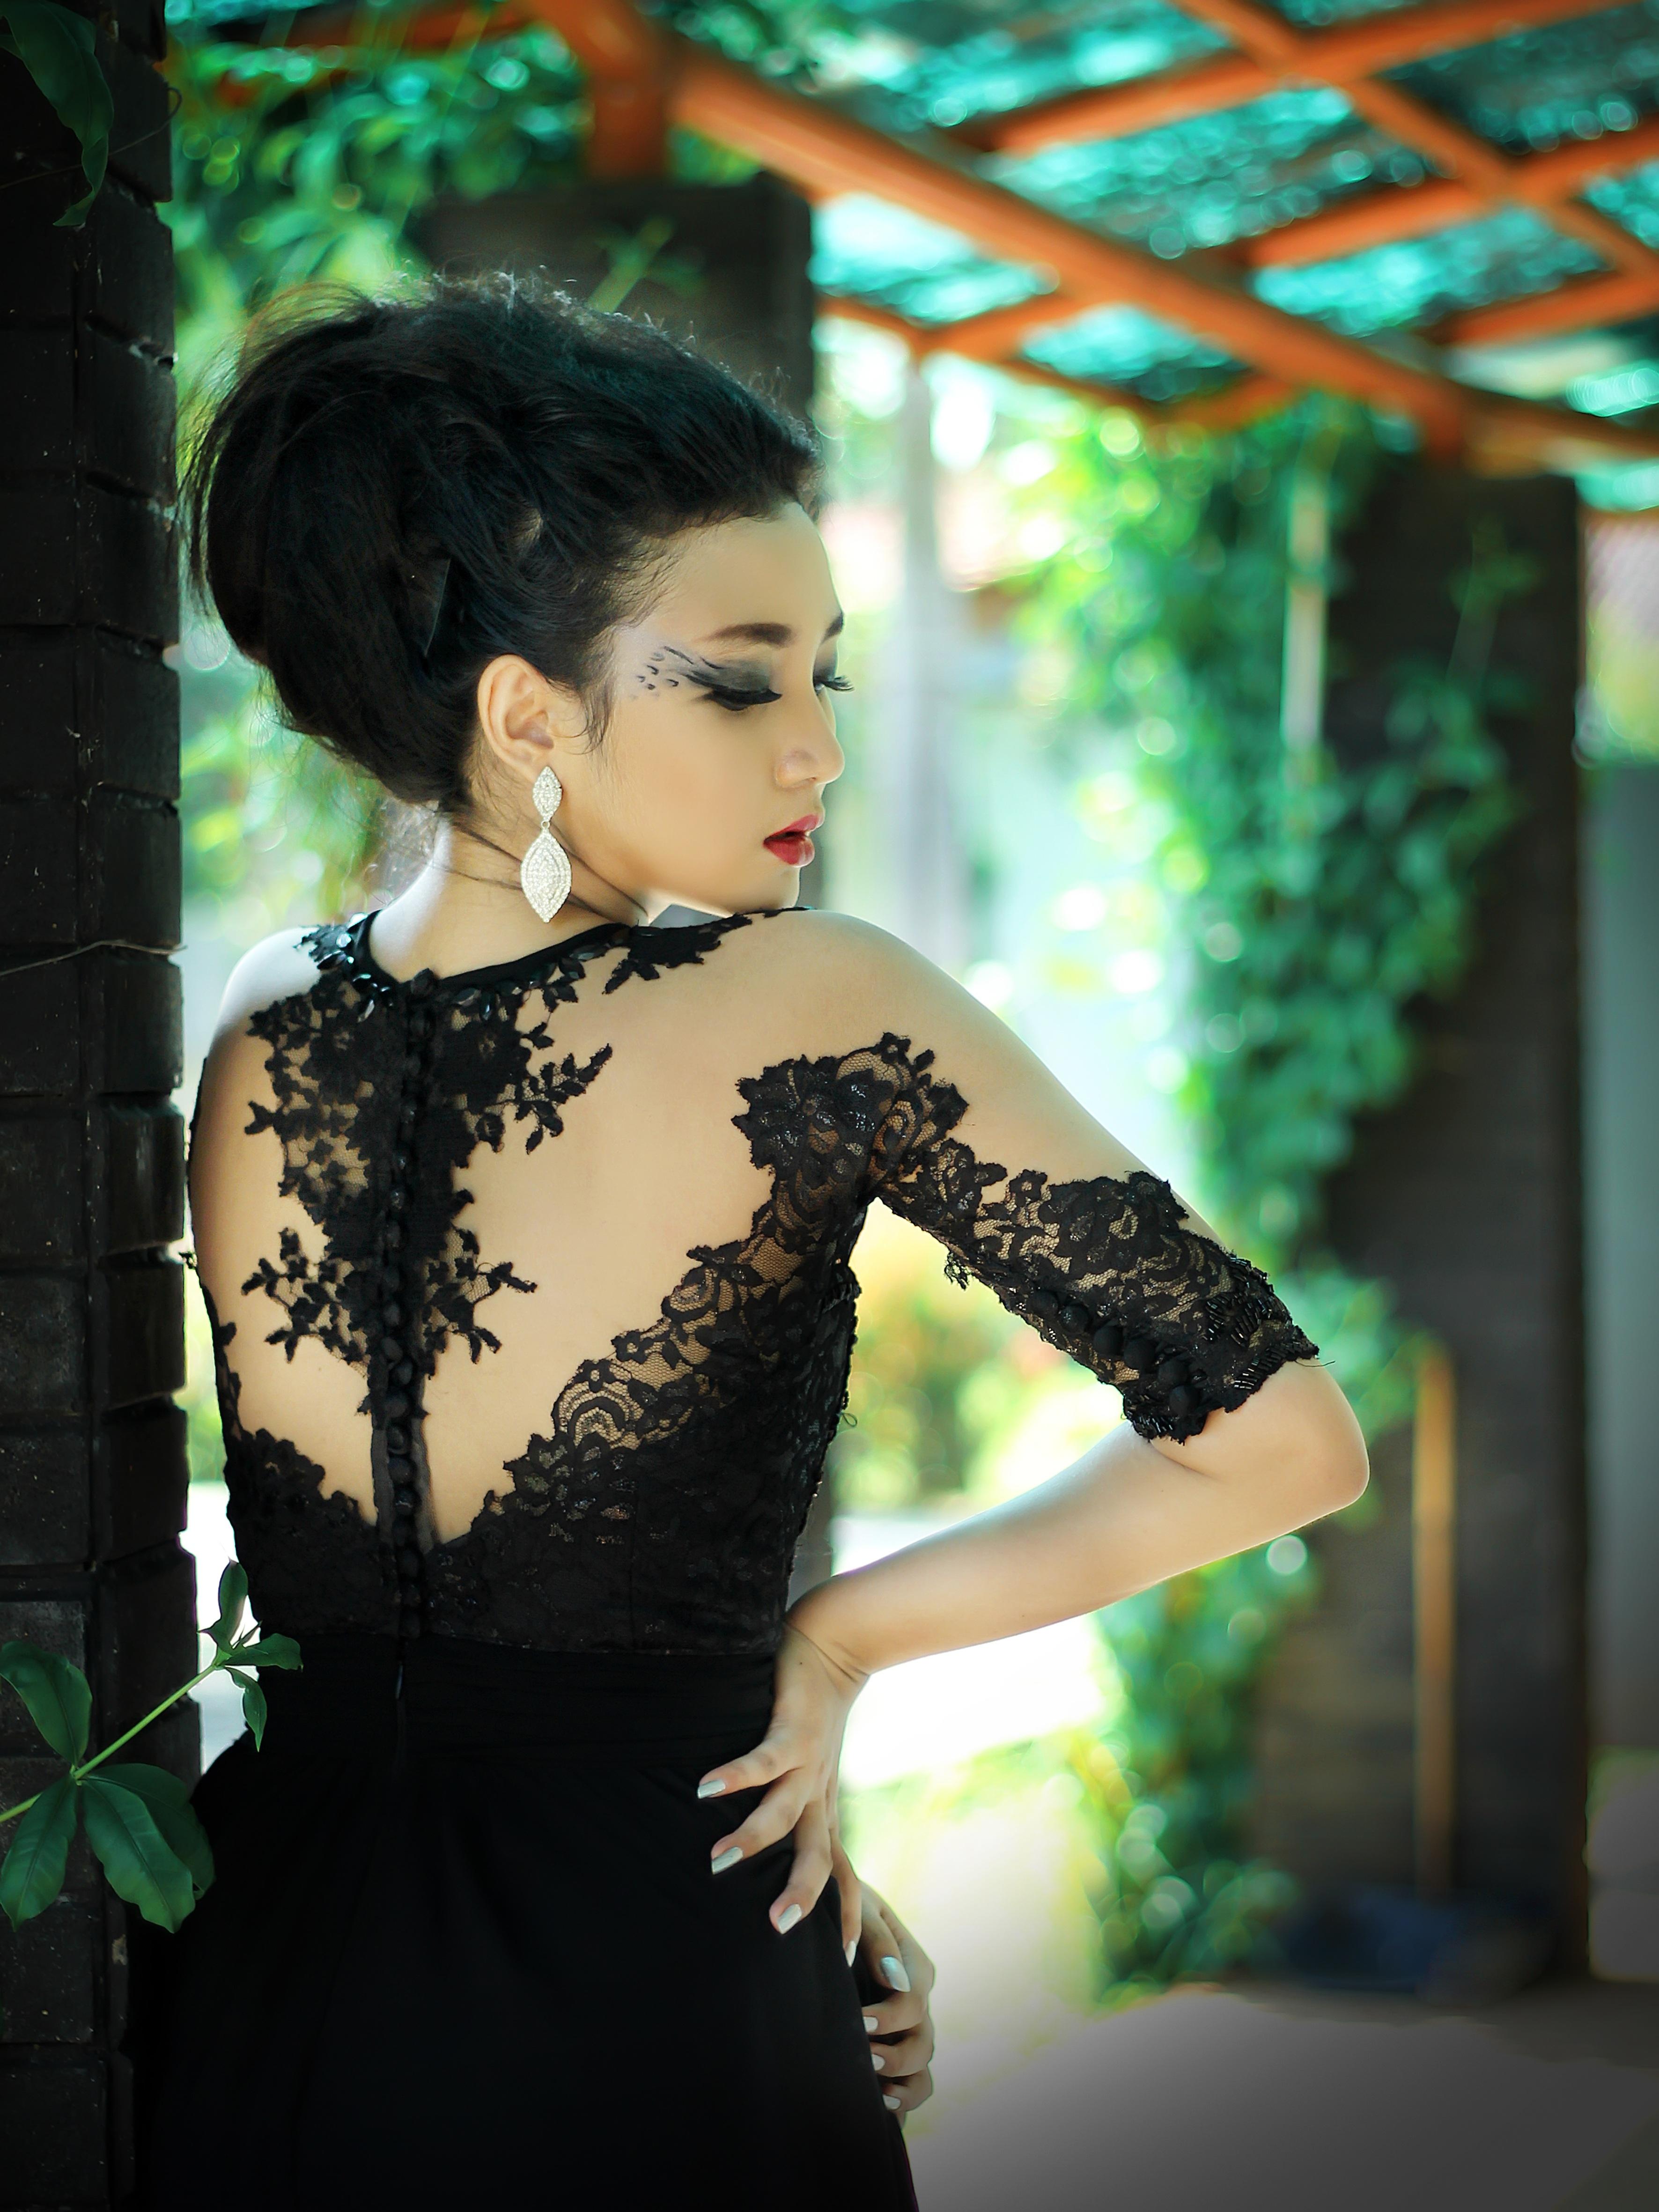 4443648b6 persona niña mujer fotografía hembra patrón modelo verde Moda ropa negro  dama vestir diseño belleza hermosa